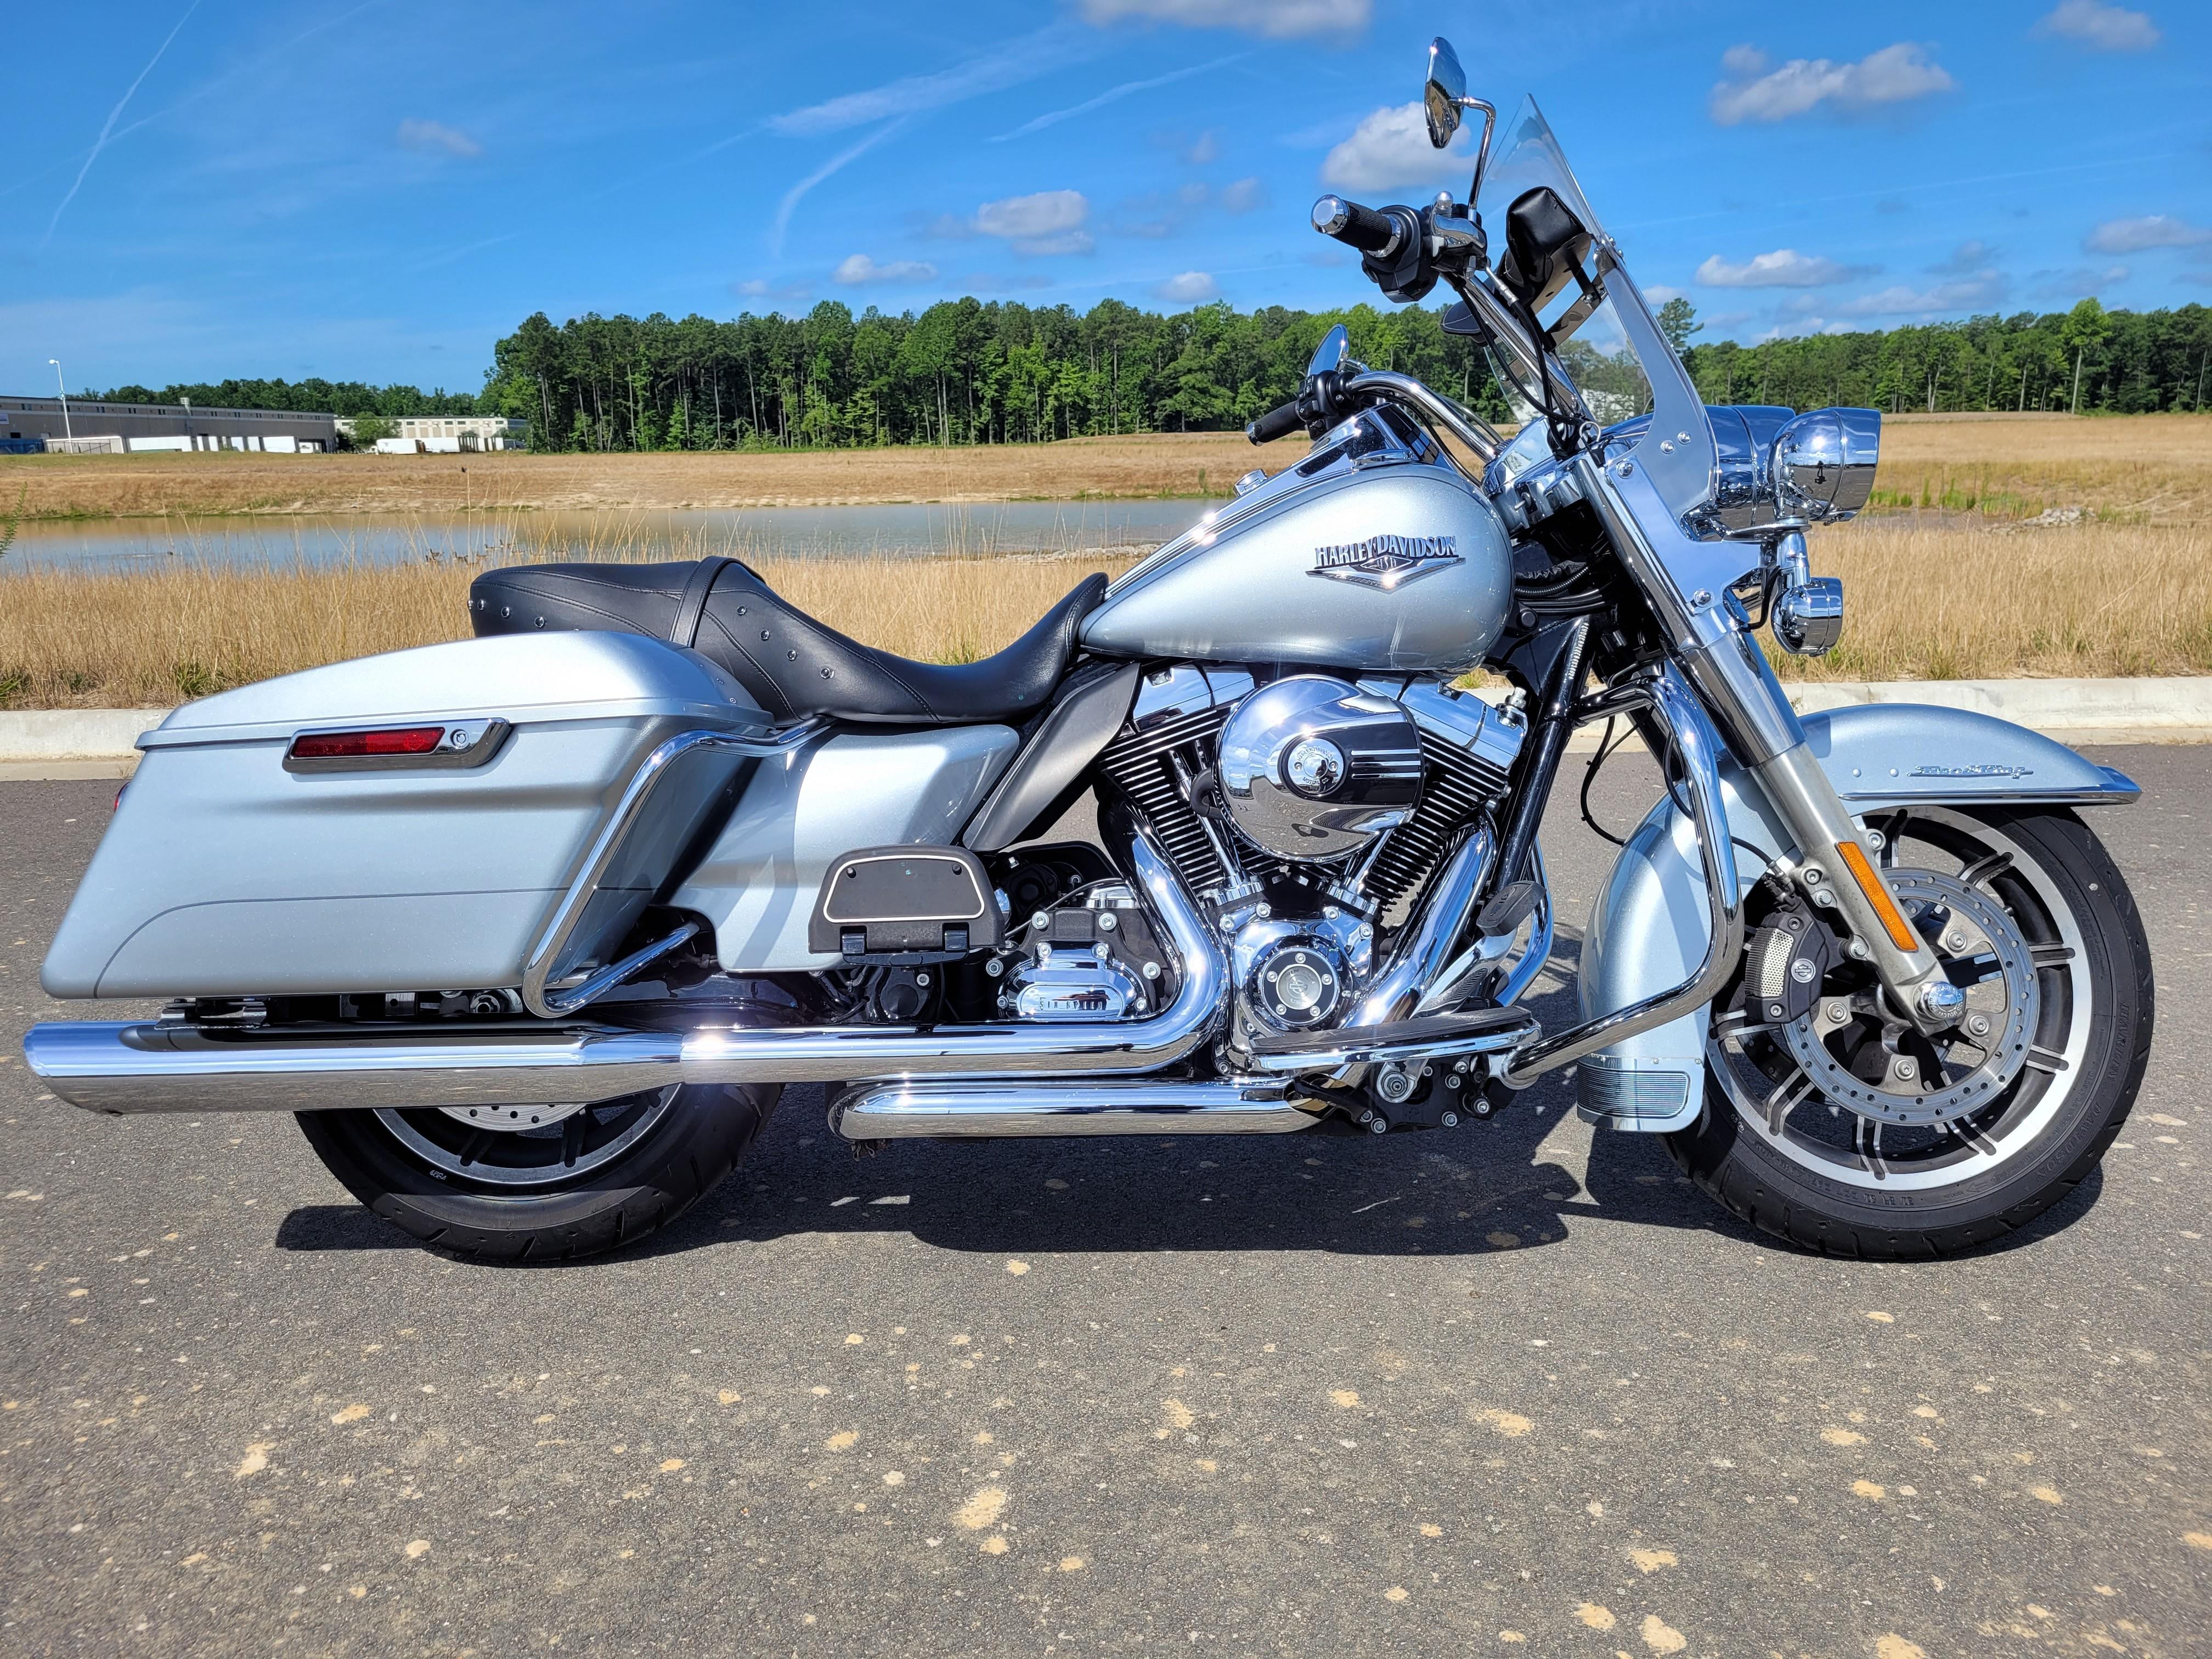 2014 Harley-Davidson Road King Base at Richmond Harley-Davidson